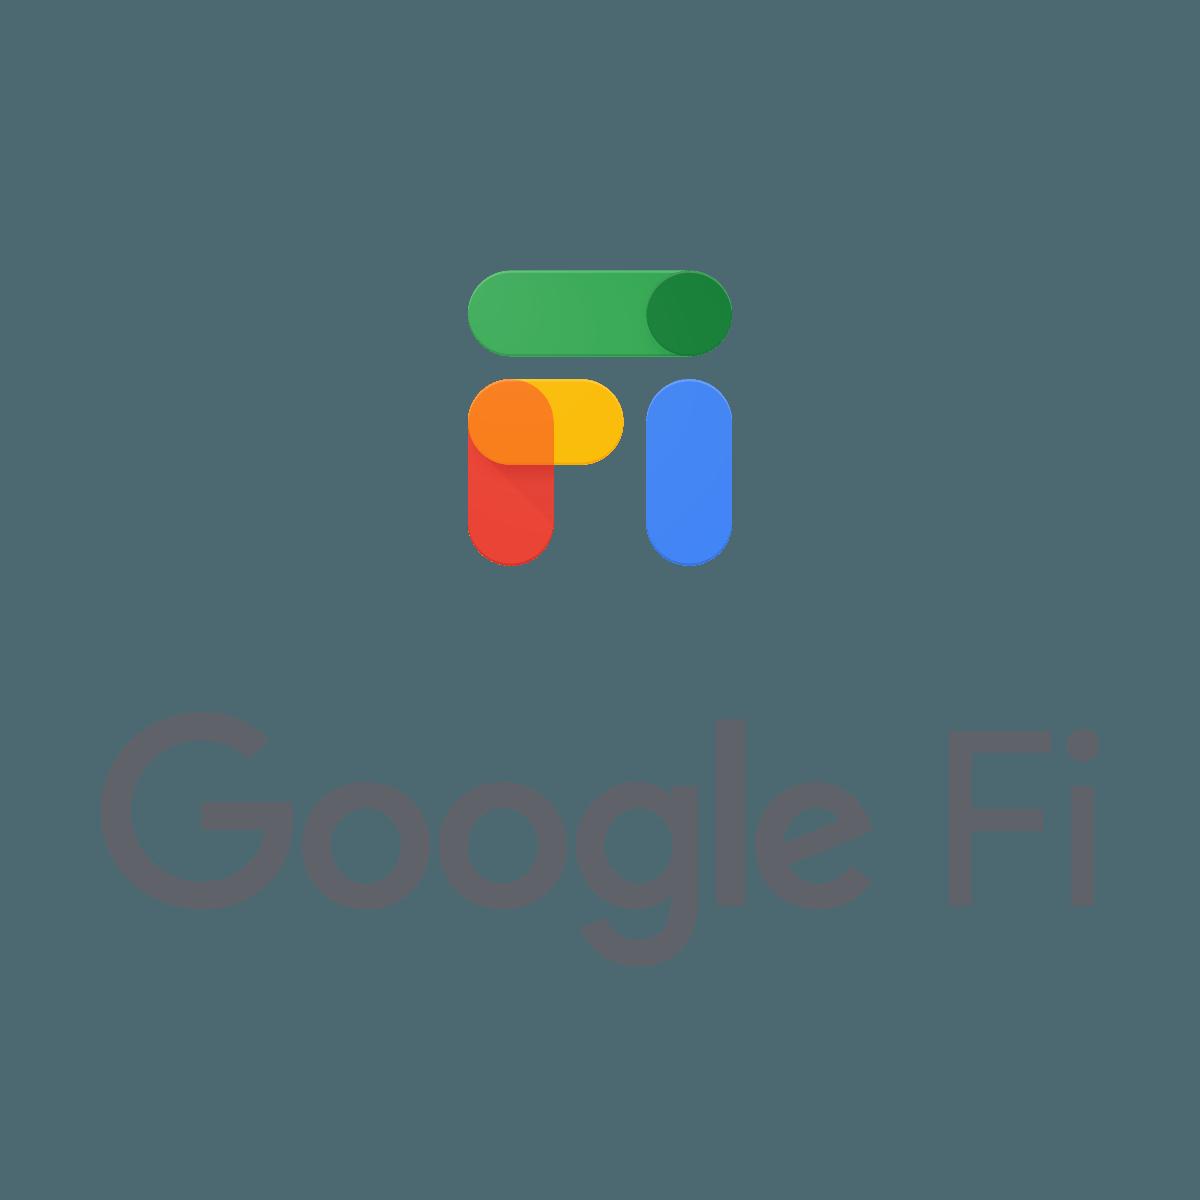 GoogleFi